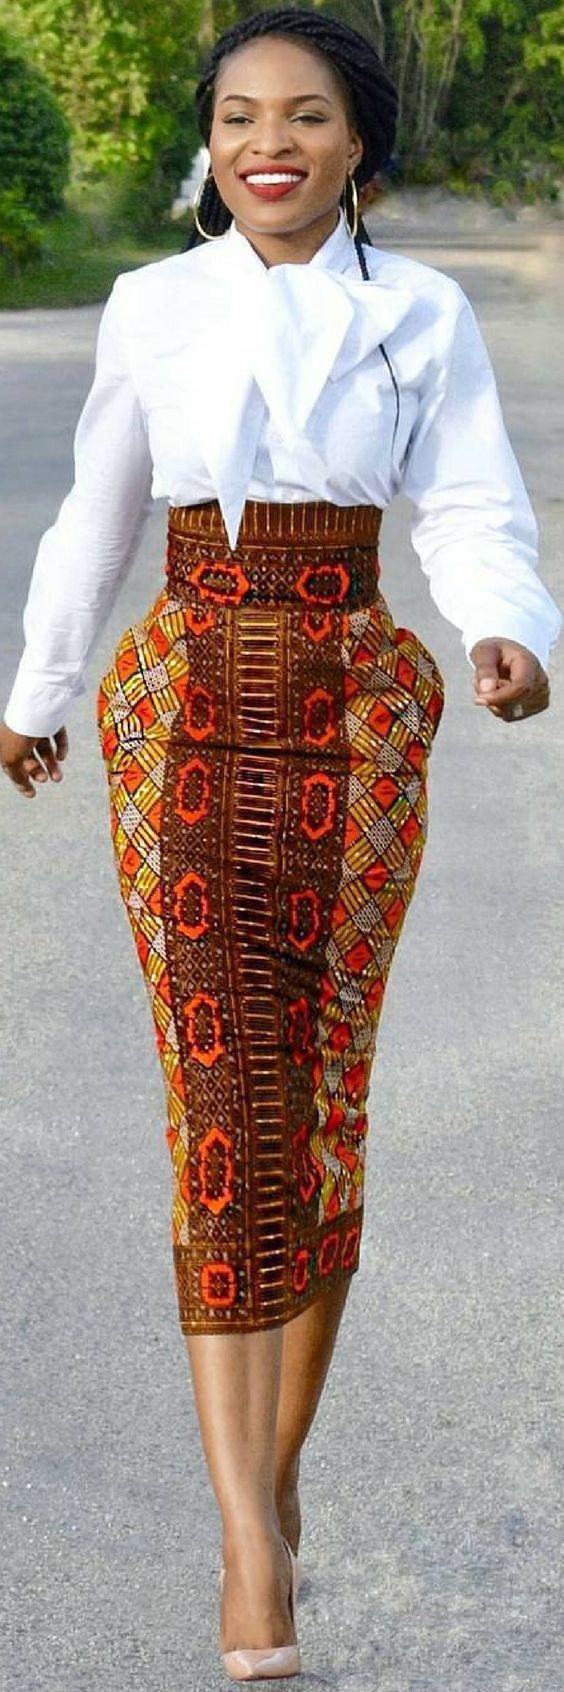 Top 25+ best High waisted skirt outfits ideas on Pinterest ...